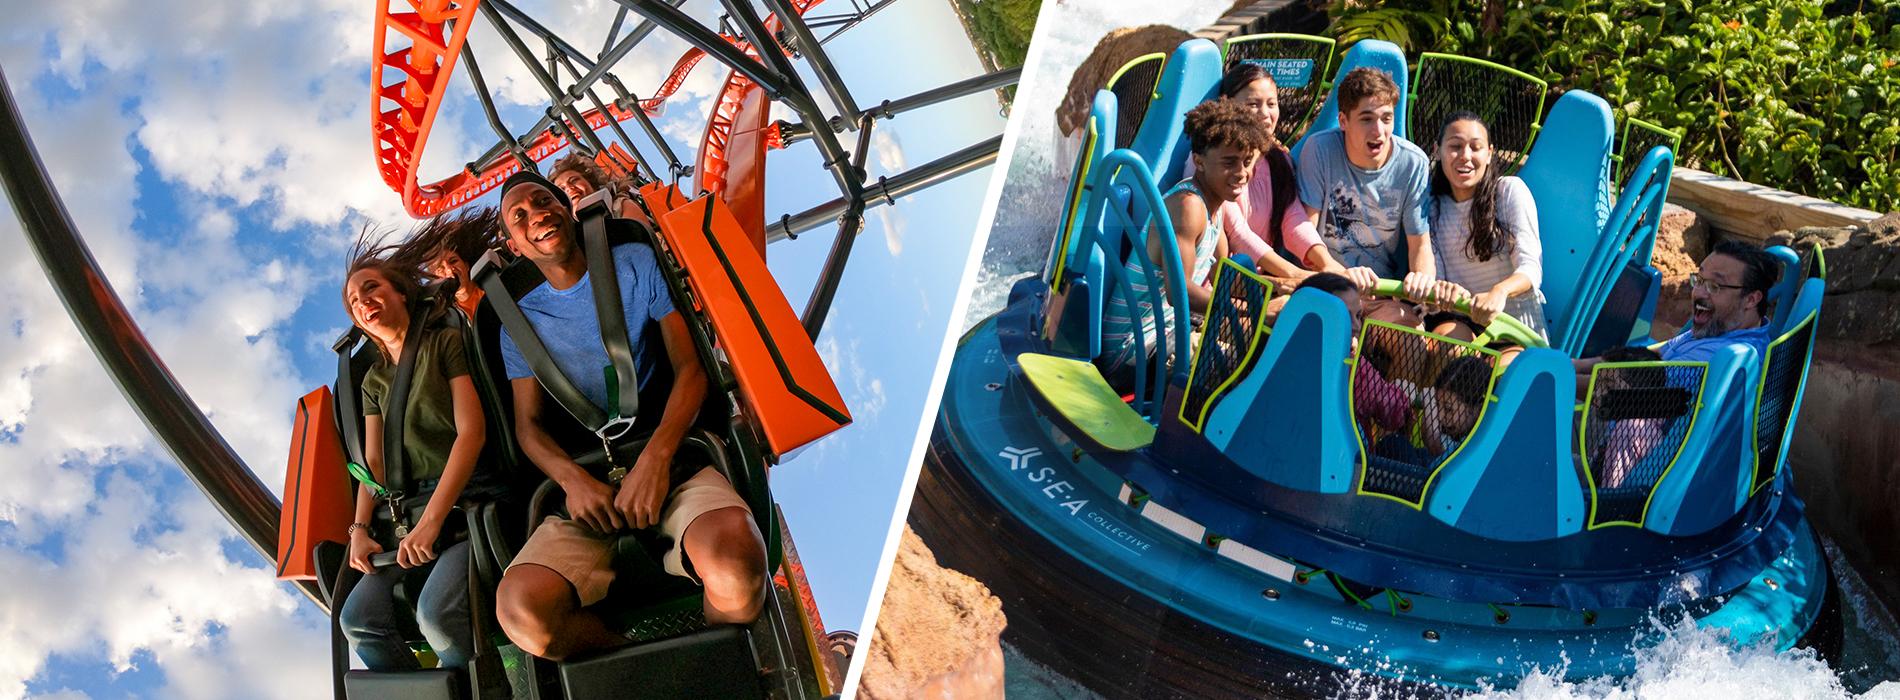 2 Park Offer to Busch Gardens and SeaWorld Orlando